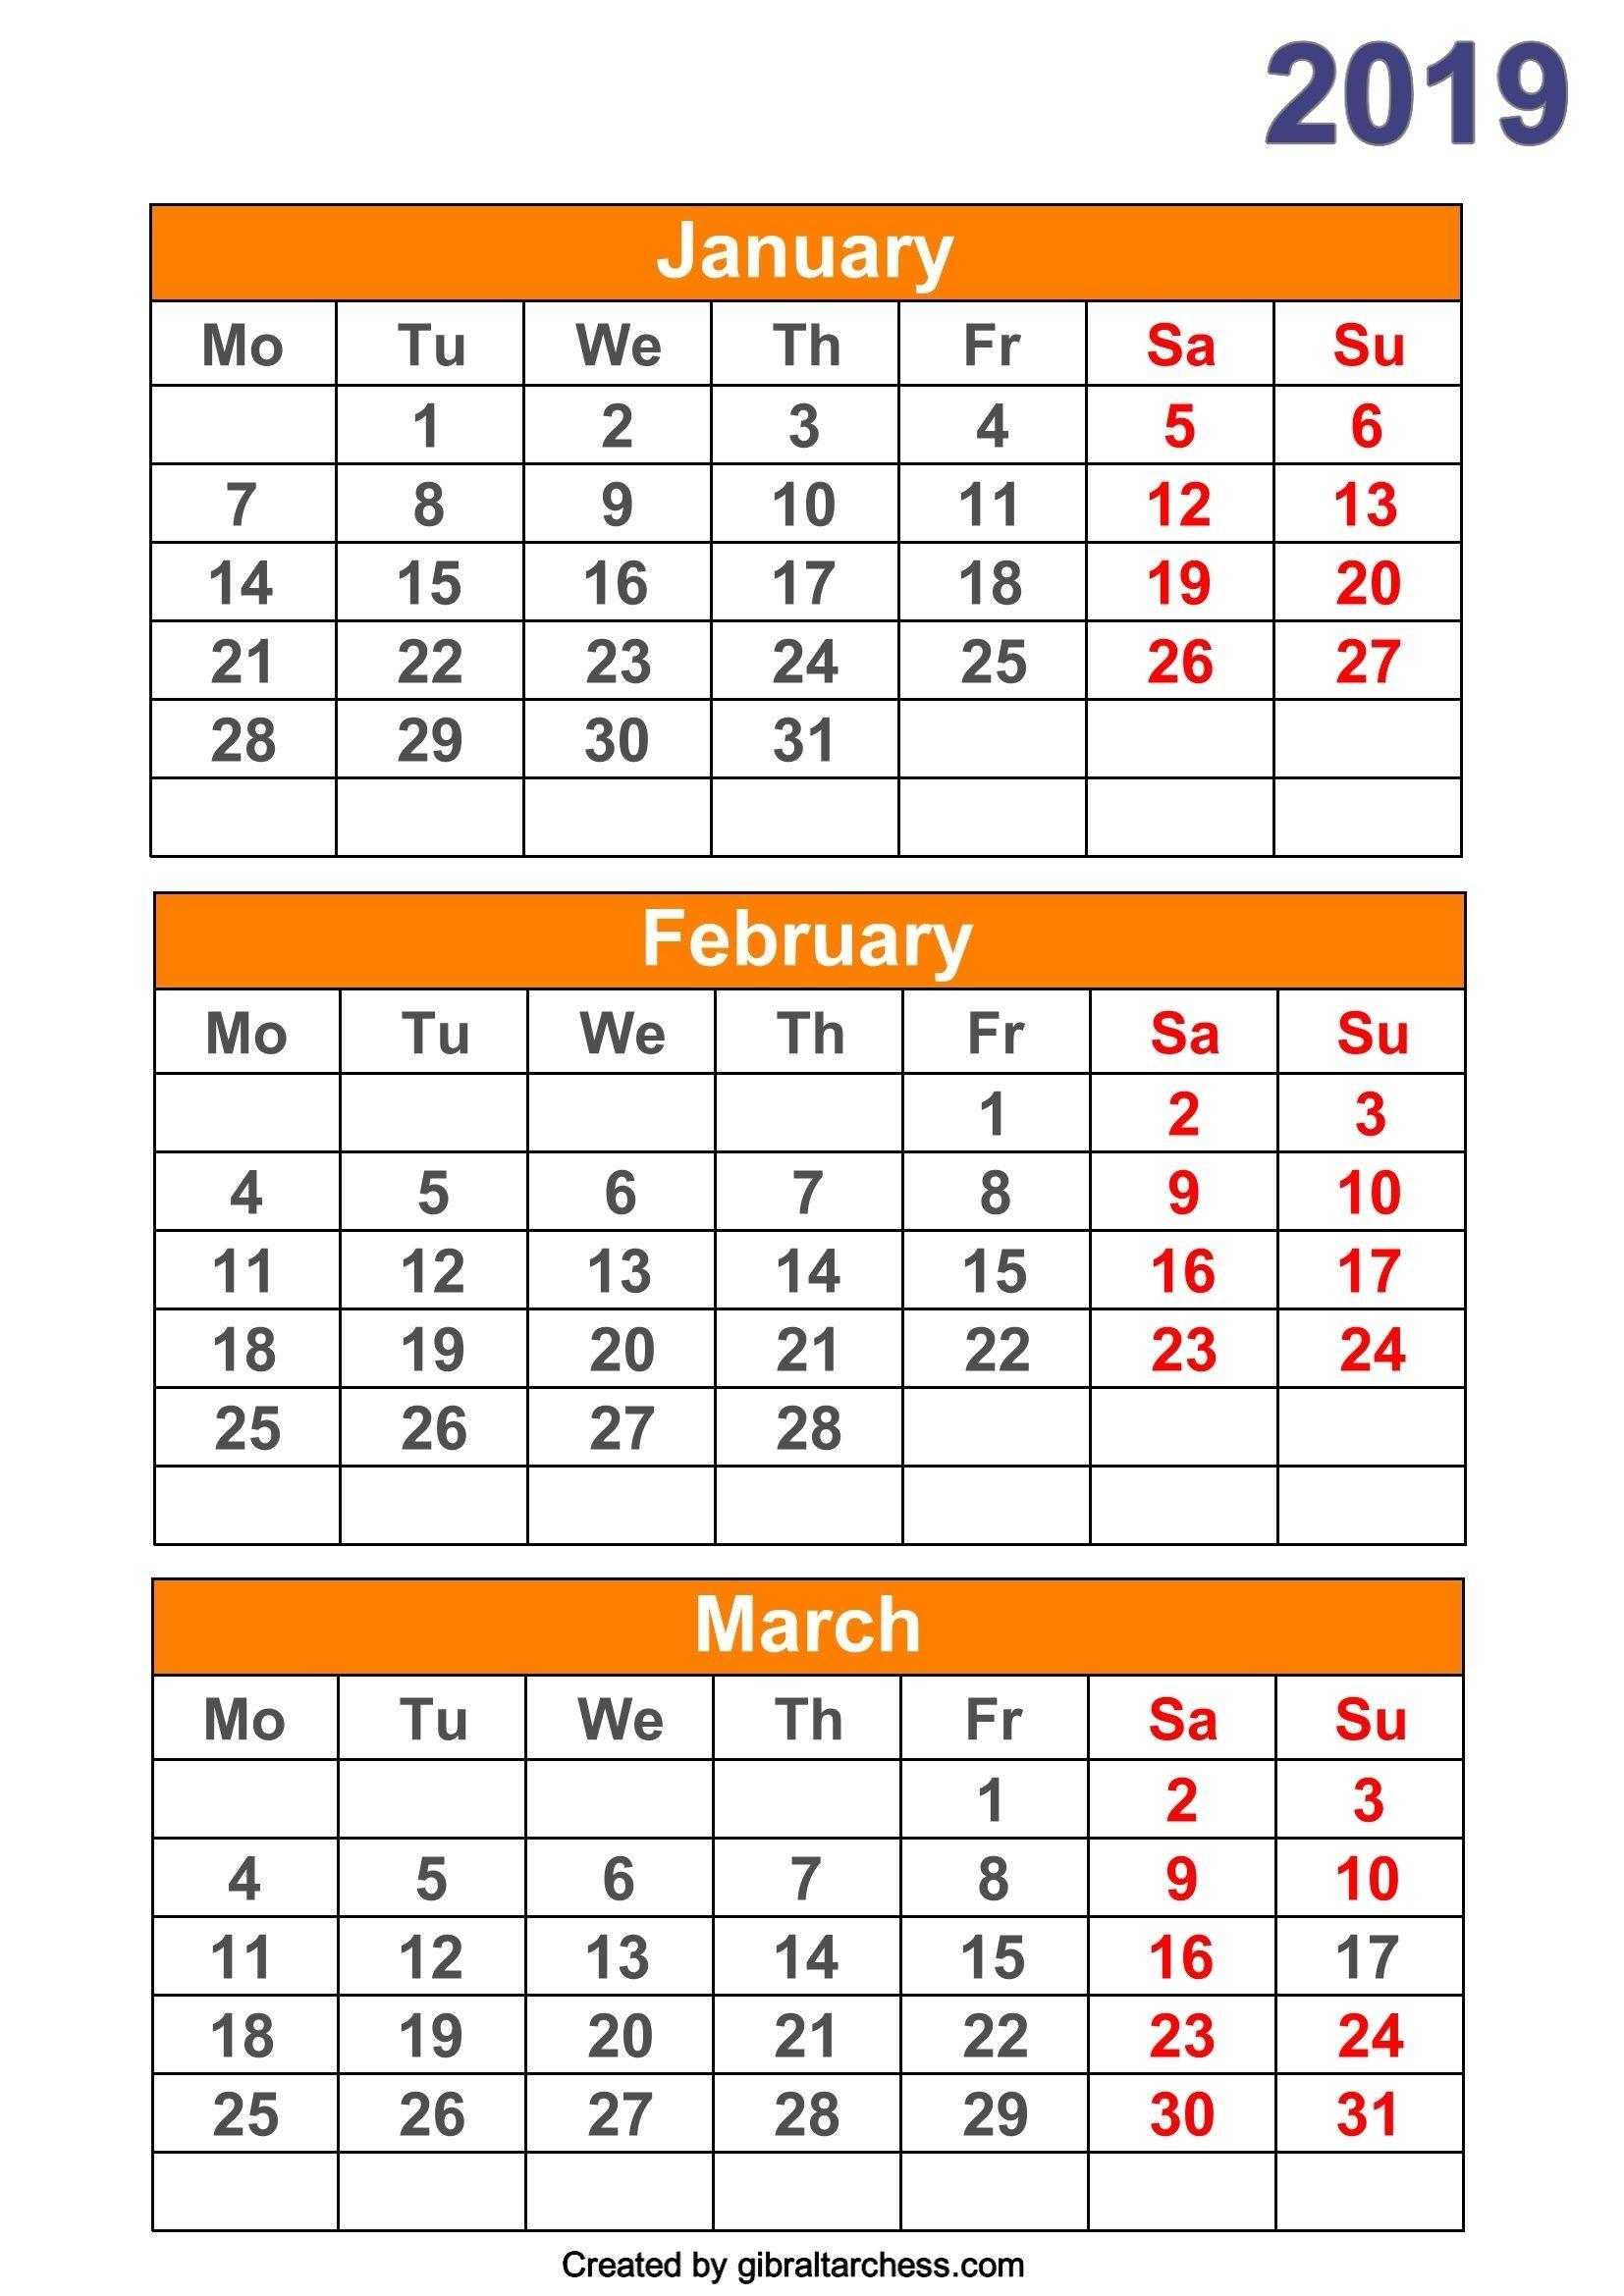 2019 Calendar 4 Months Per Page Printable  Blank Calendar 4 Months